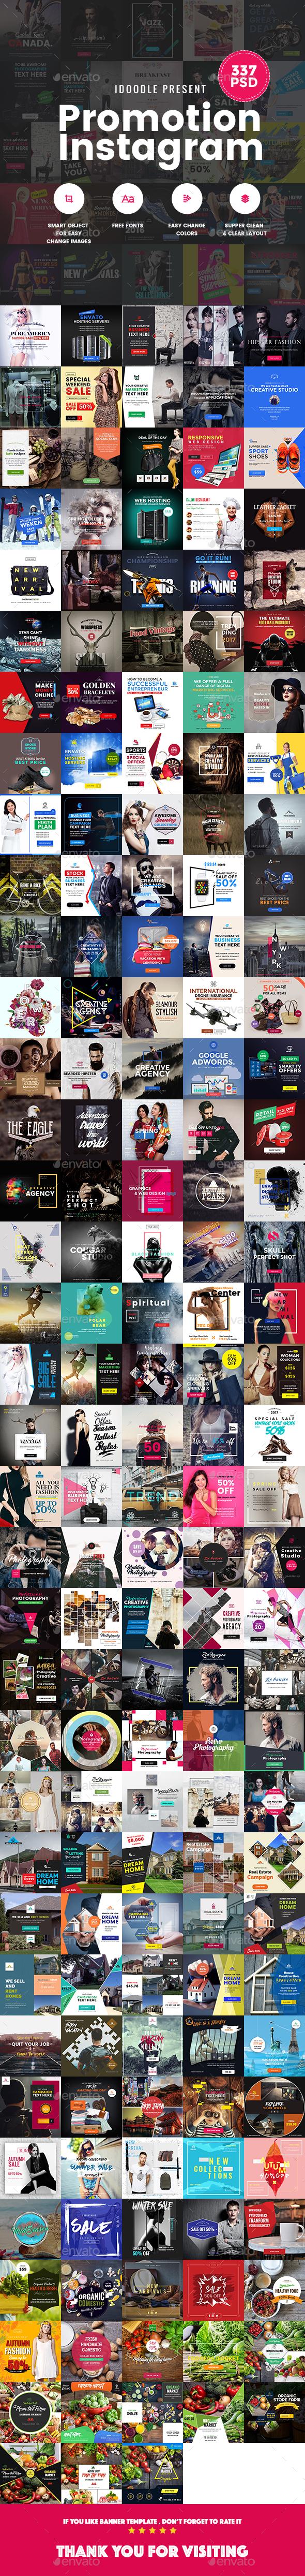 Promotion Instagram Banners Ads Bundle - 337PSD [09 Sets] - Miscellaneous Social Media